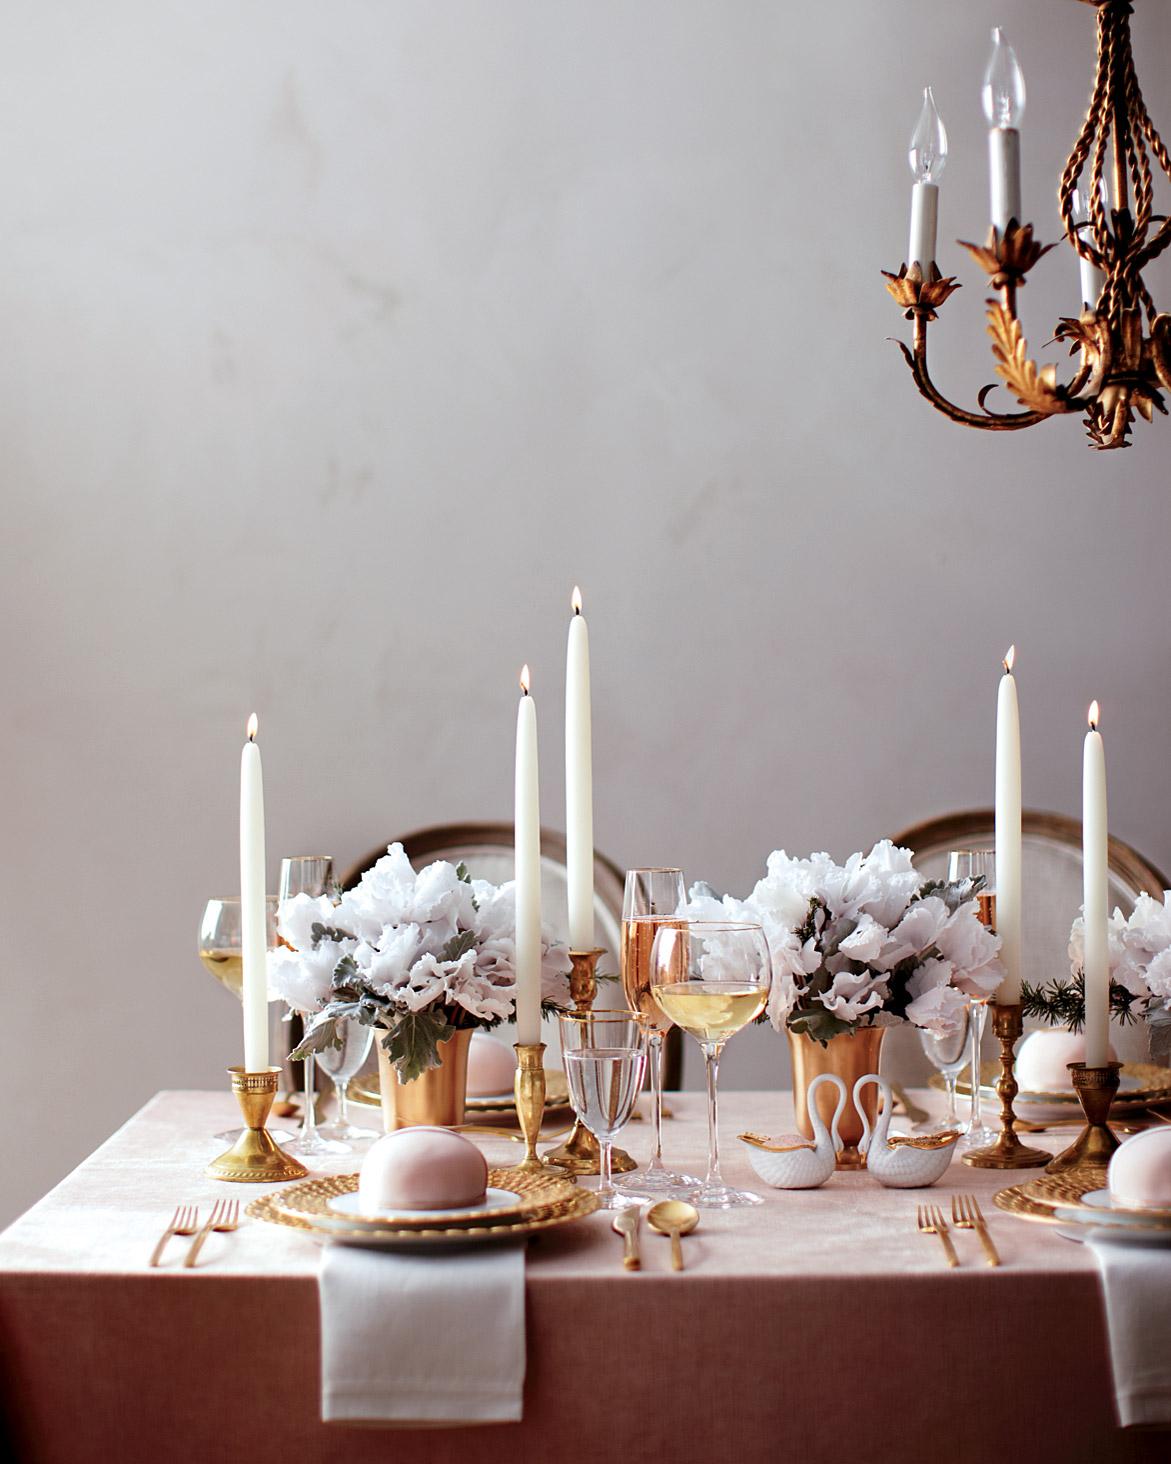 table-setting-2-mwd107369.jpg